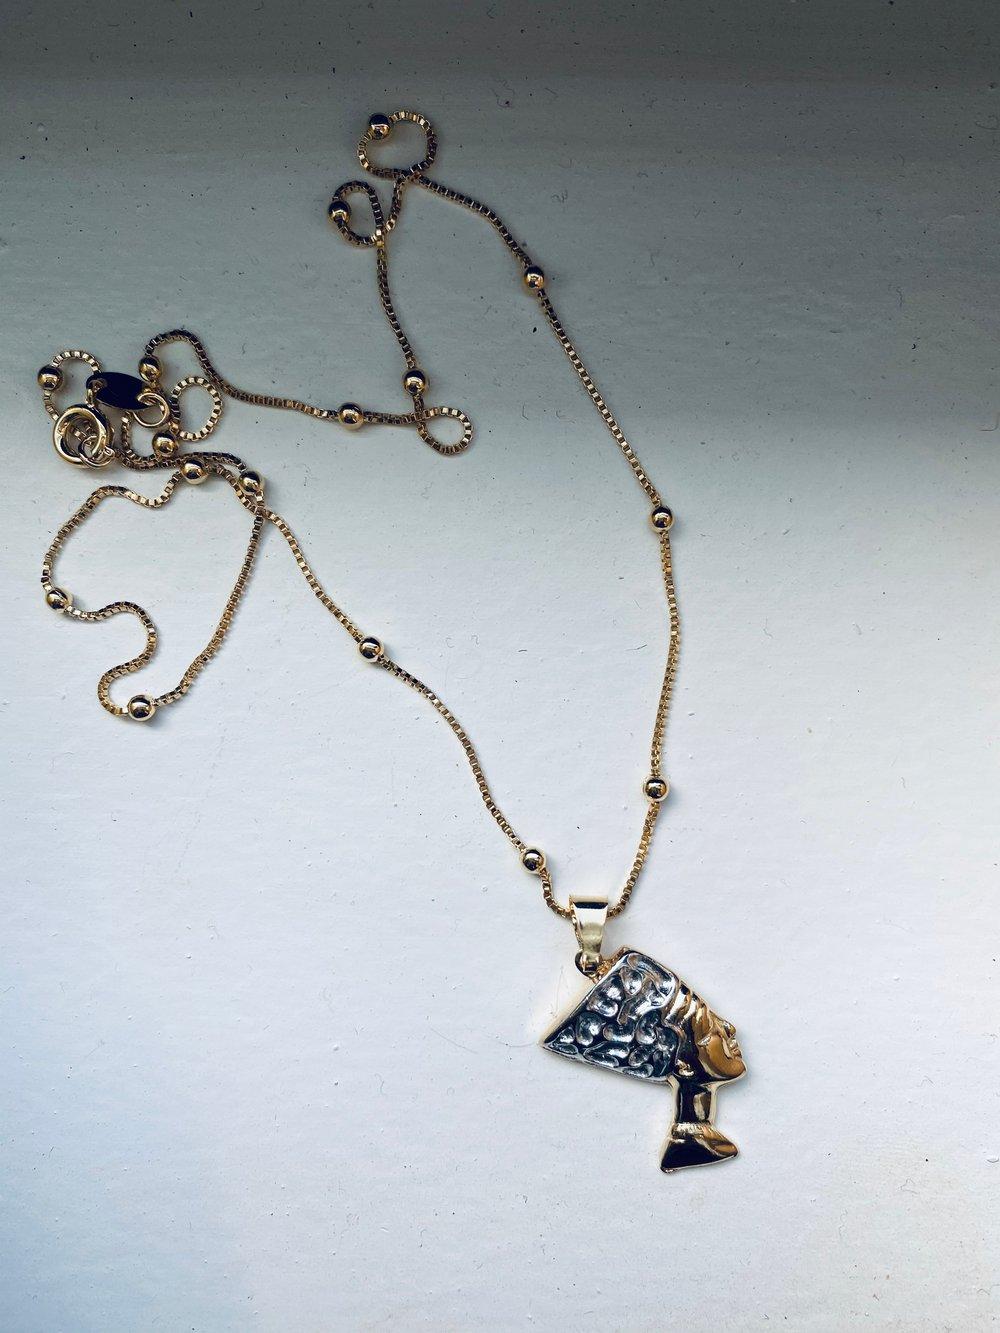 Nefertiti necklace (individual)